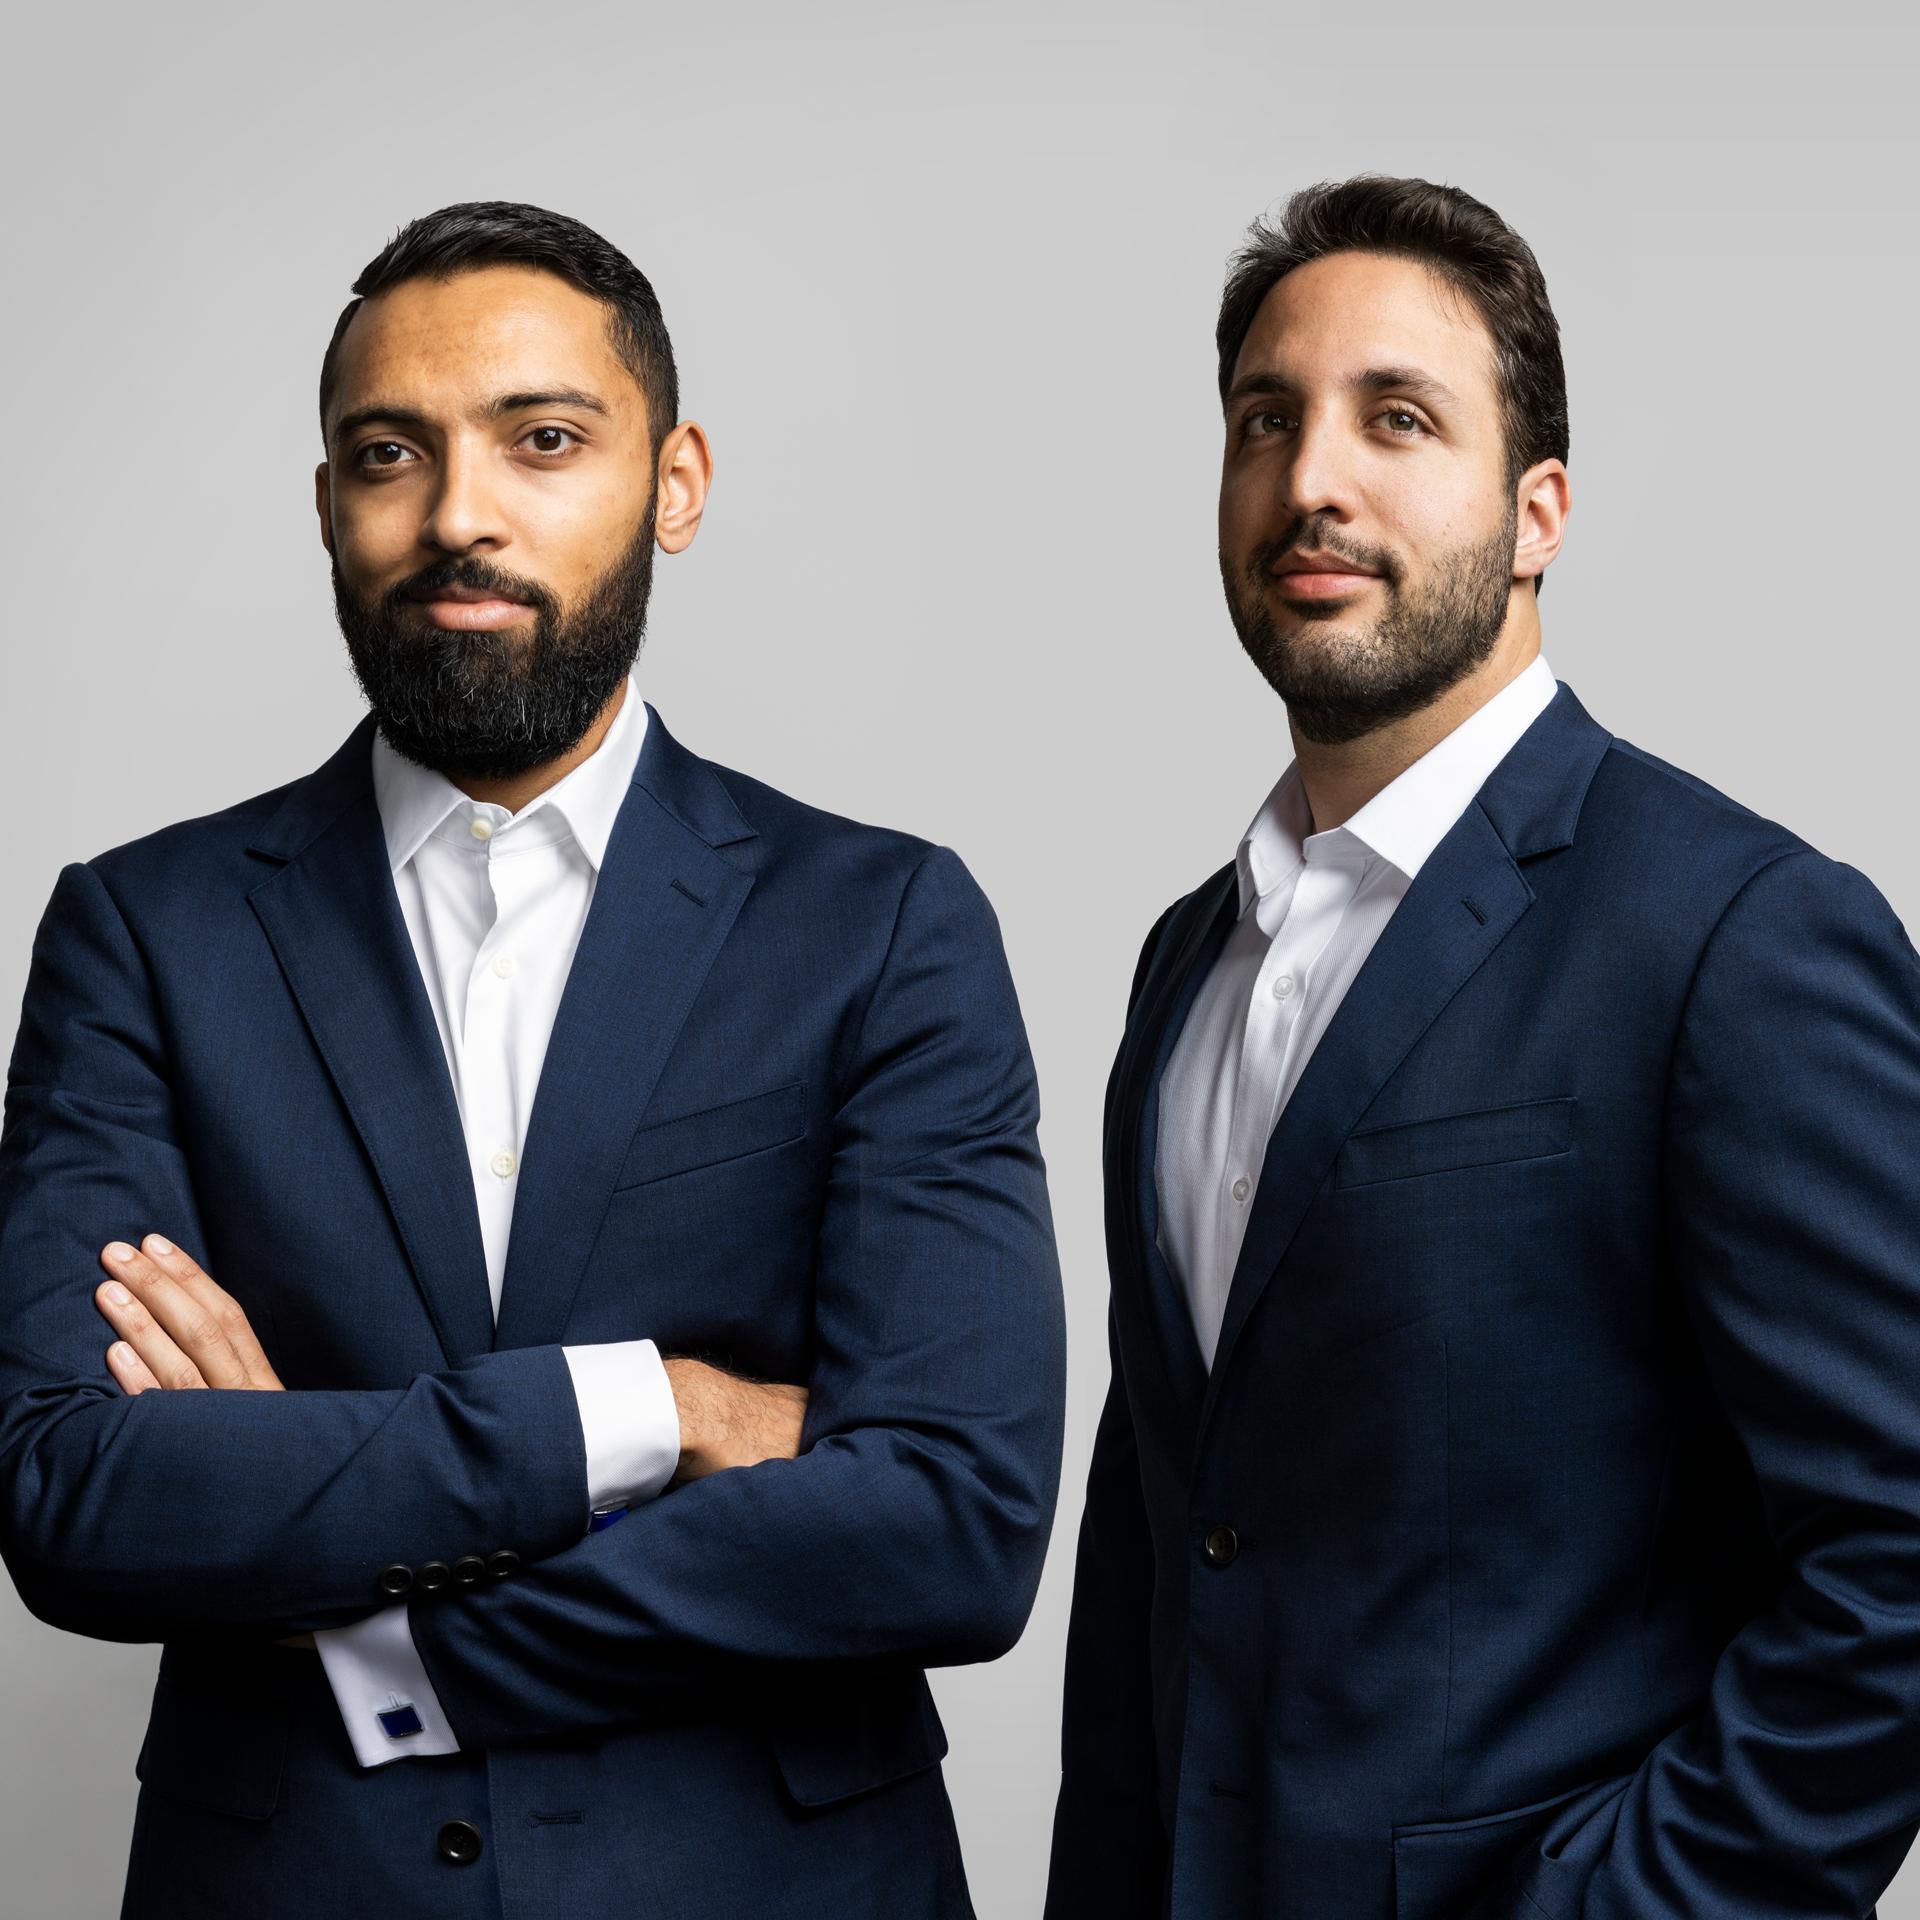 Multicoin Capital's founders and best friends Tushar Jain (left) and Kyle Samani.